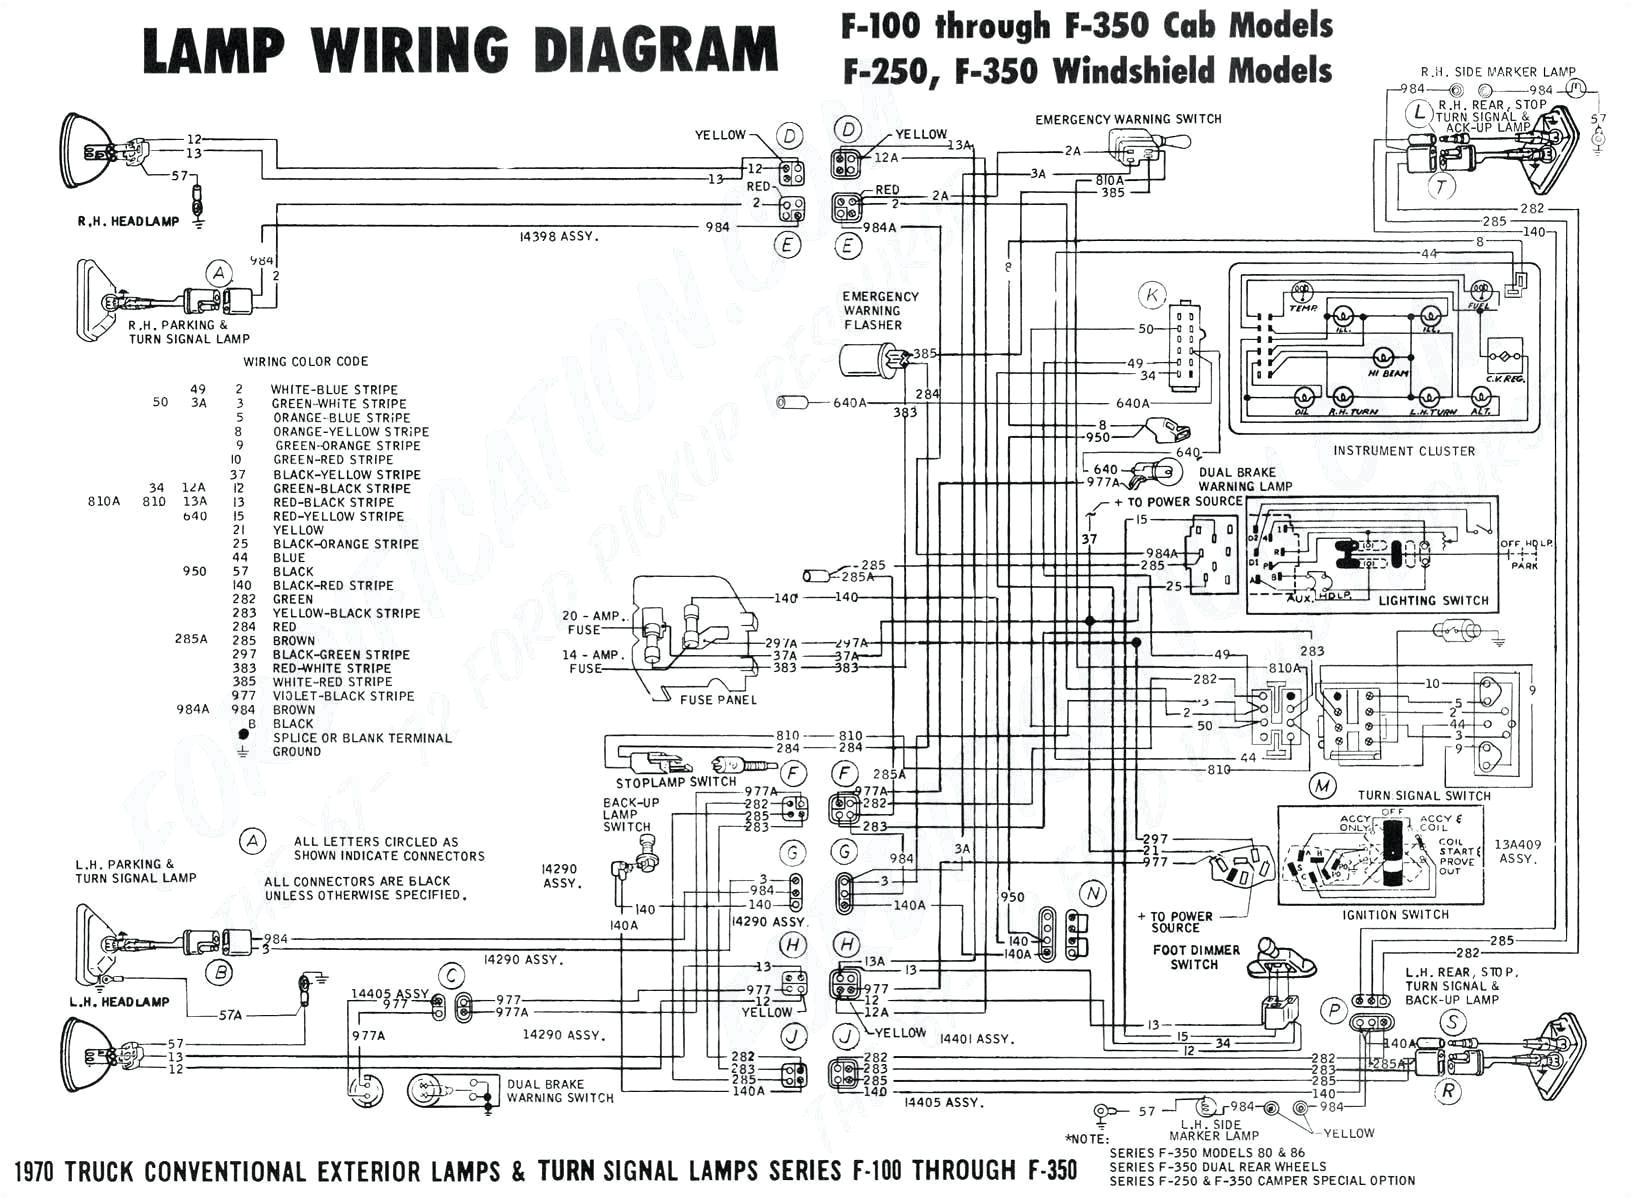 1991 plymouth acclaim fuse box diagram wiring diagram paper 1991 plymouth acclaim fuse box diagram wiring